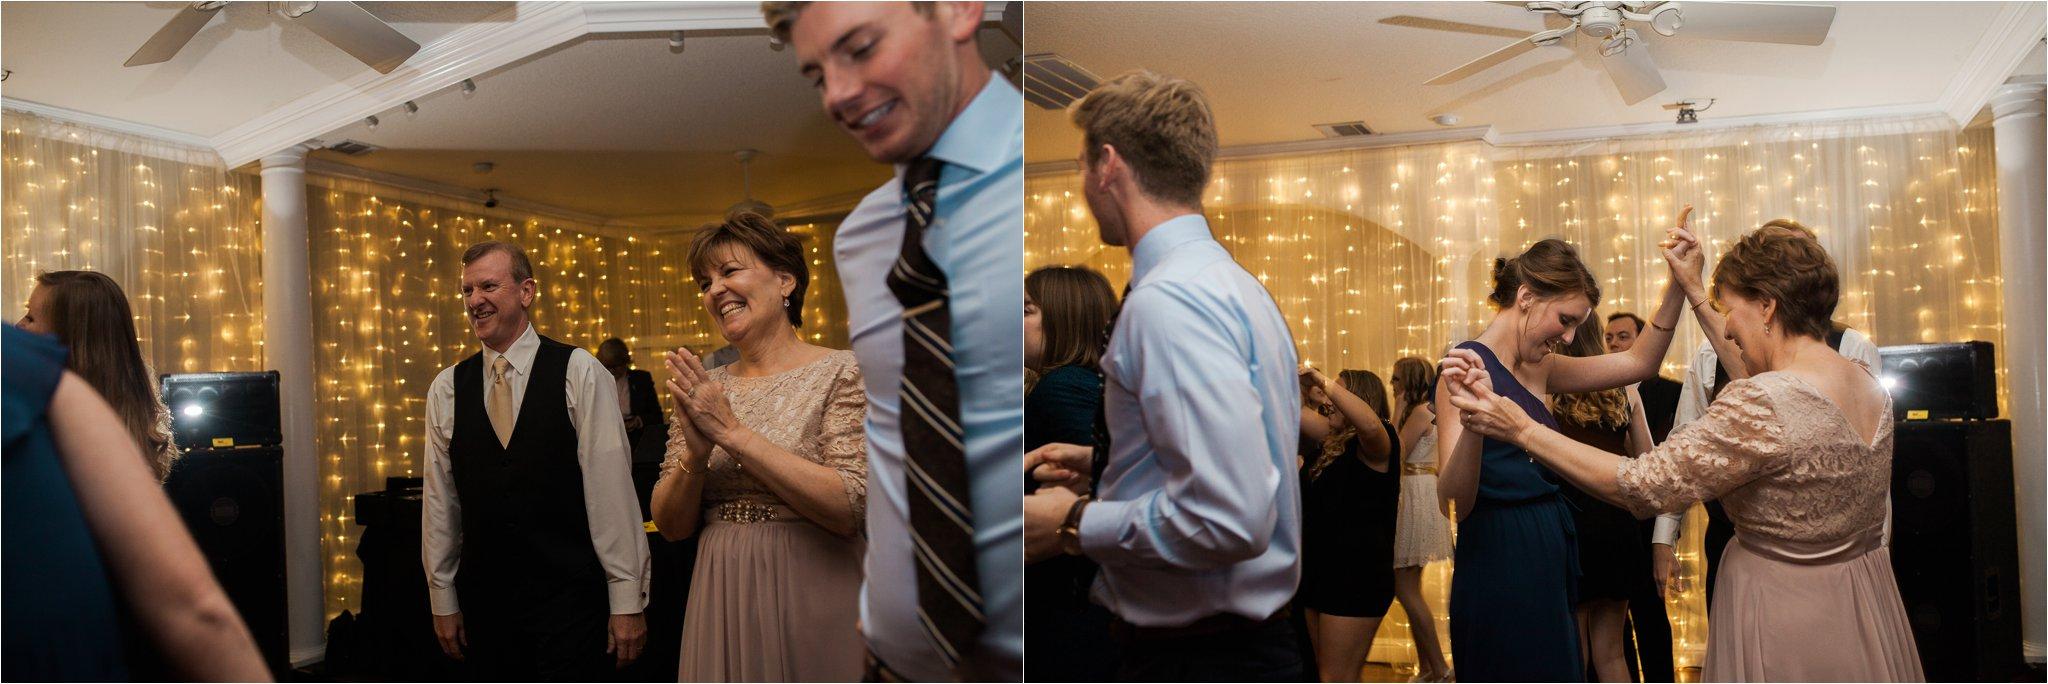 lunsford-wedding-1071.jpg